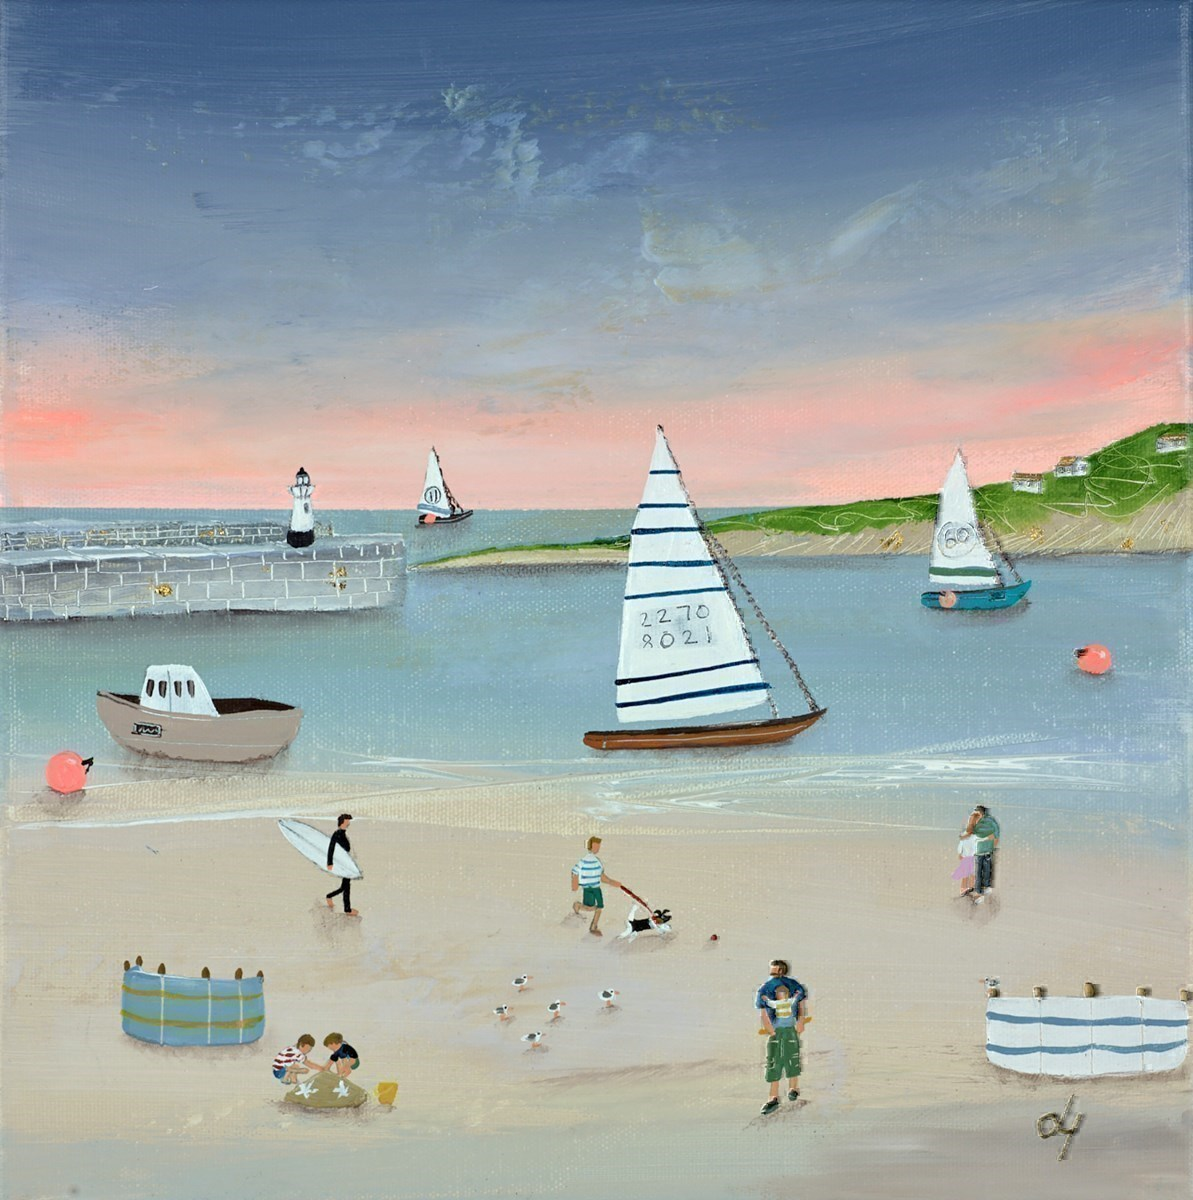 Sandcastles 'n' Sails